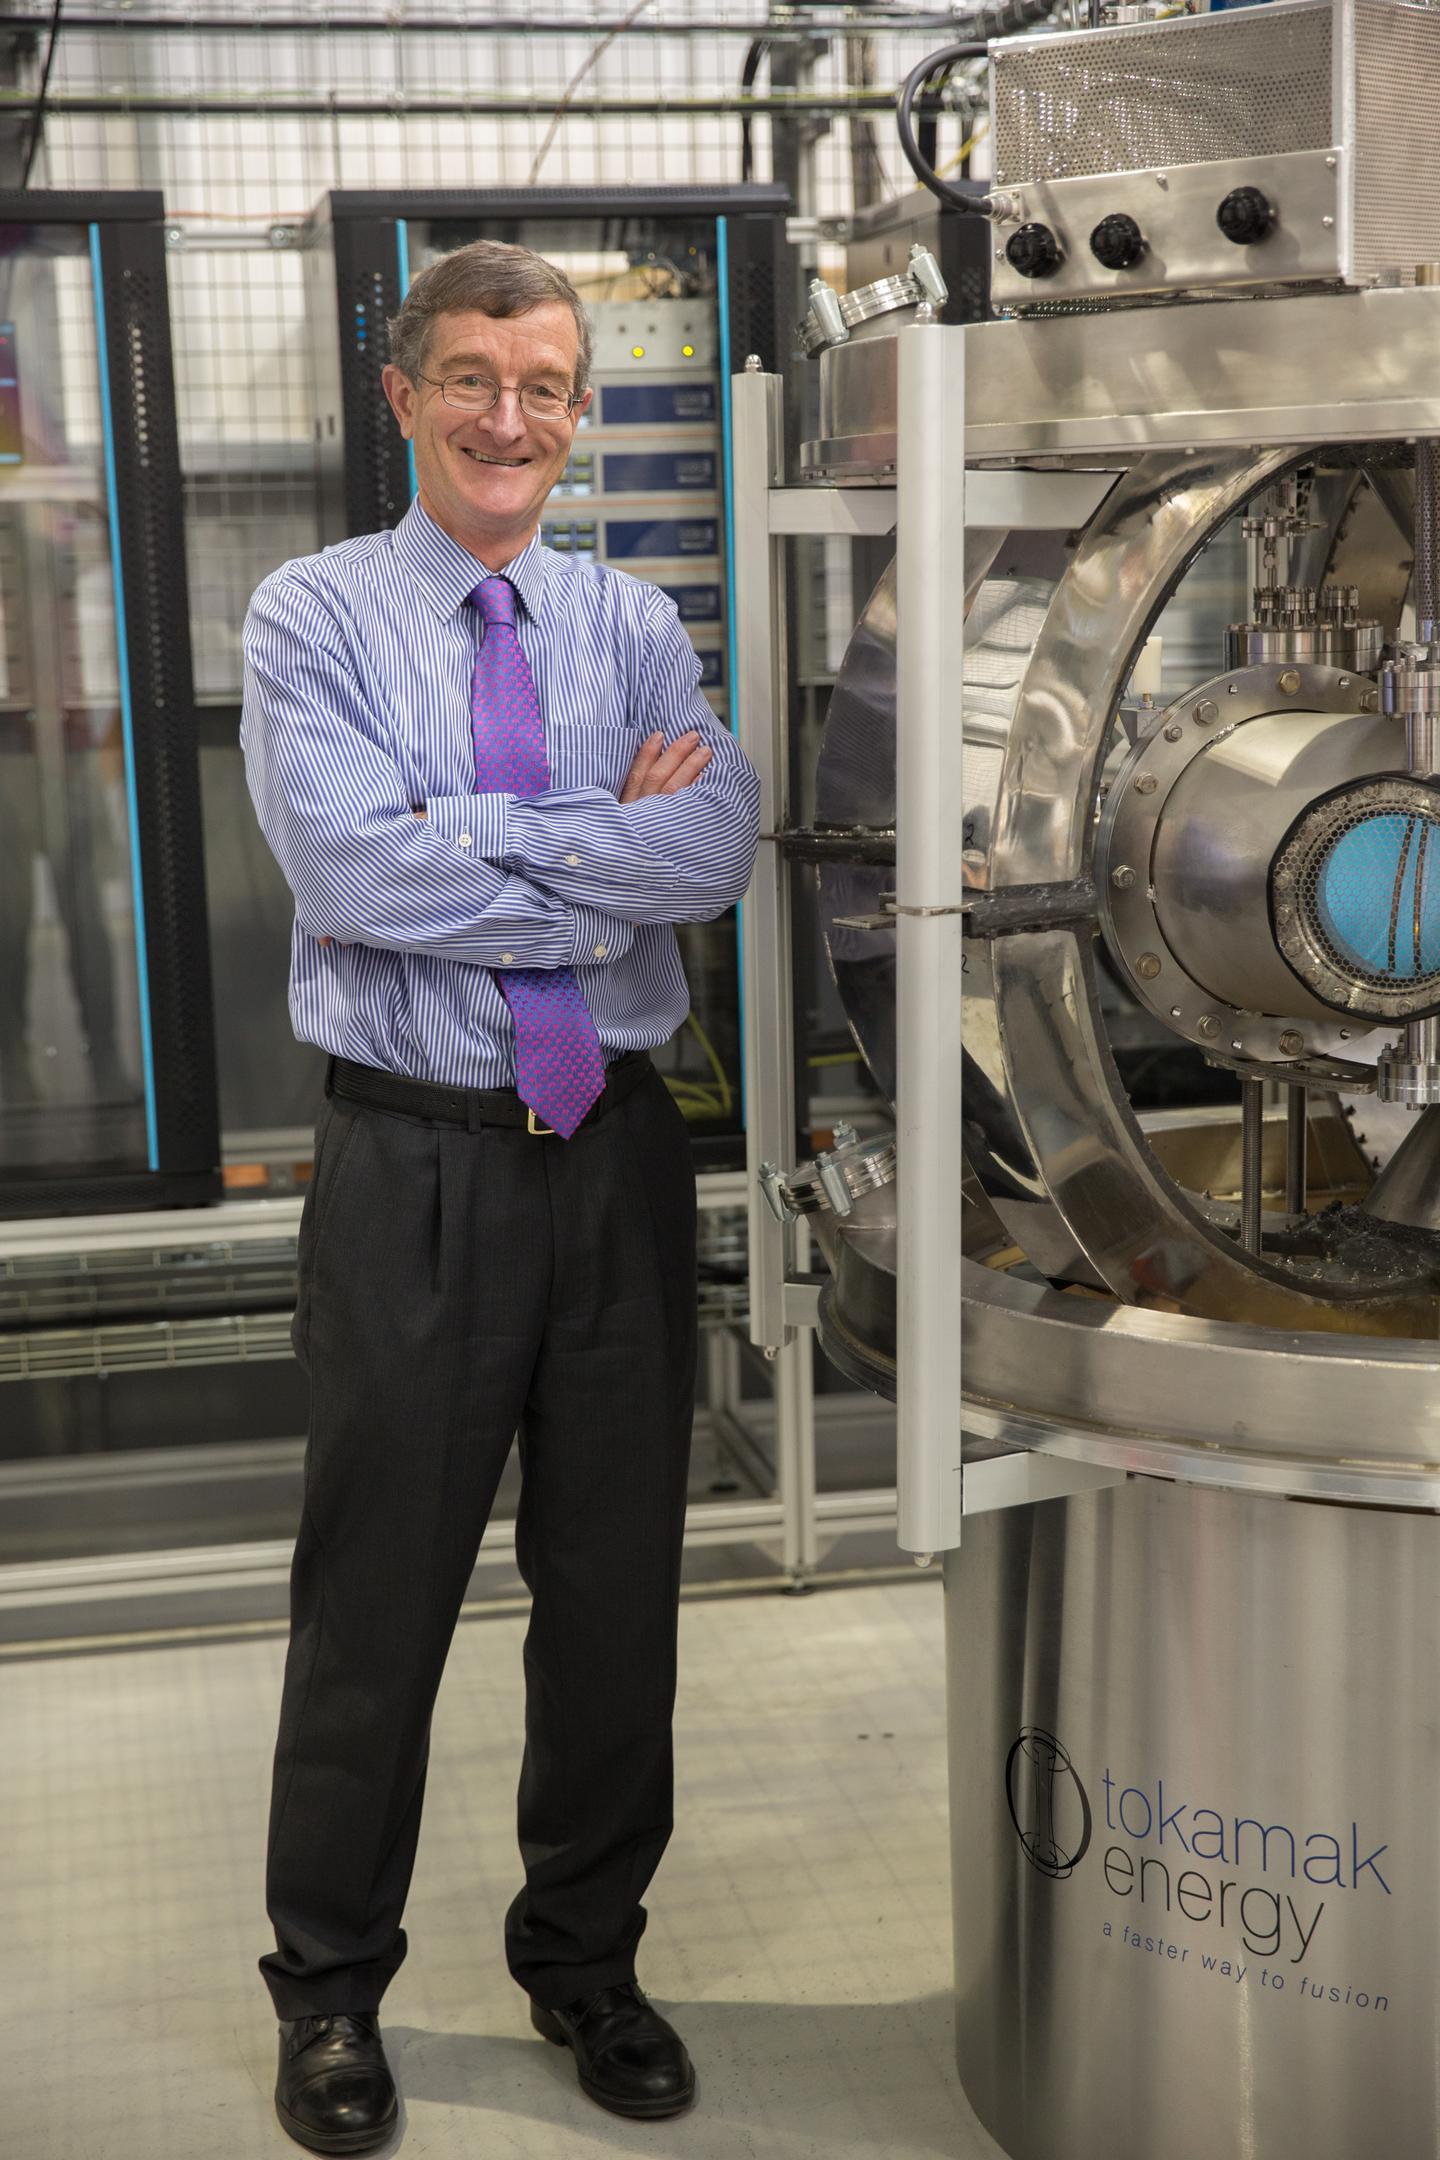 Dr David Kingham, CEO of Tokamak Energy